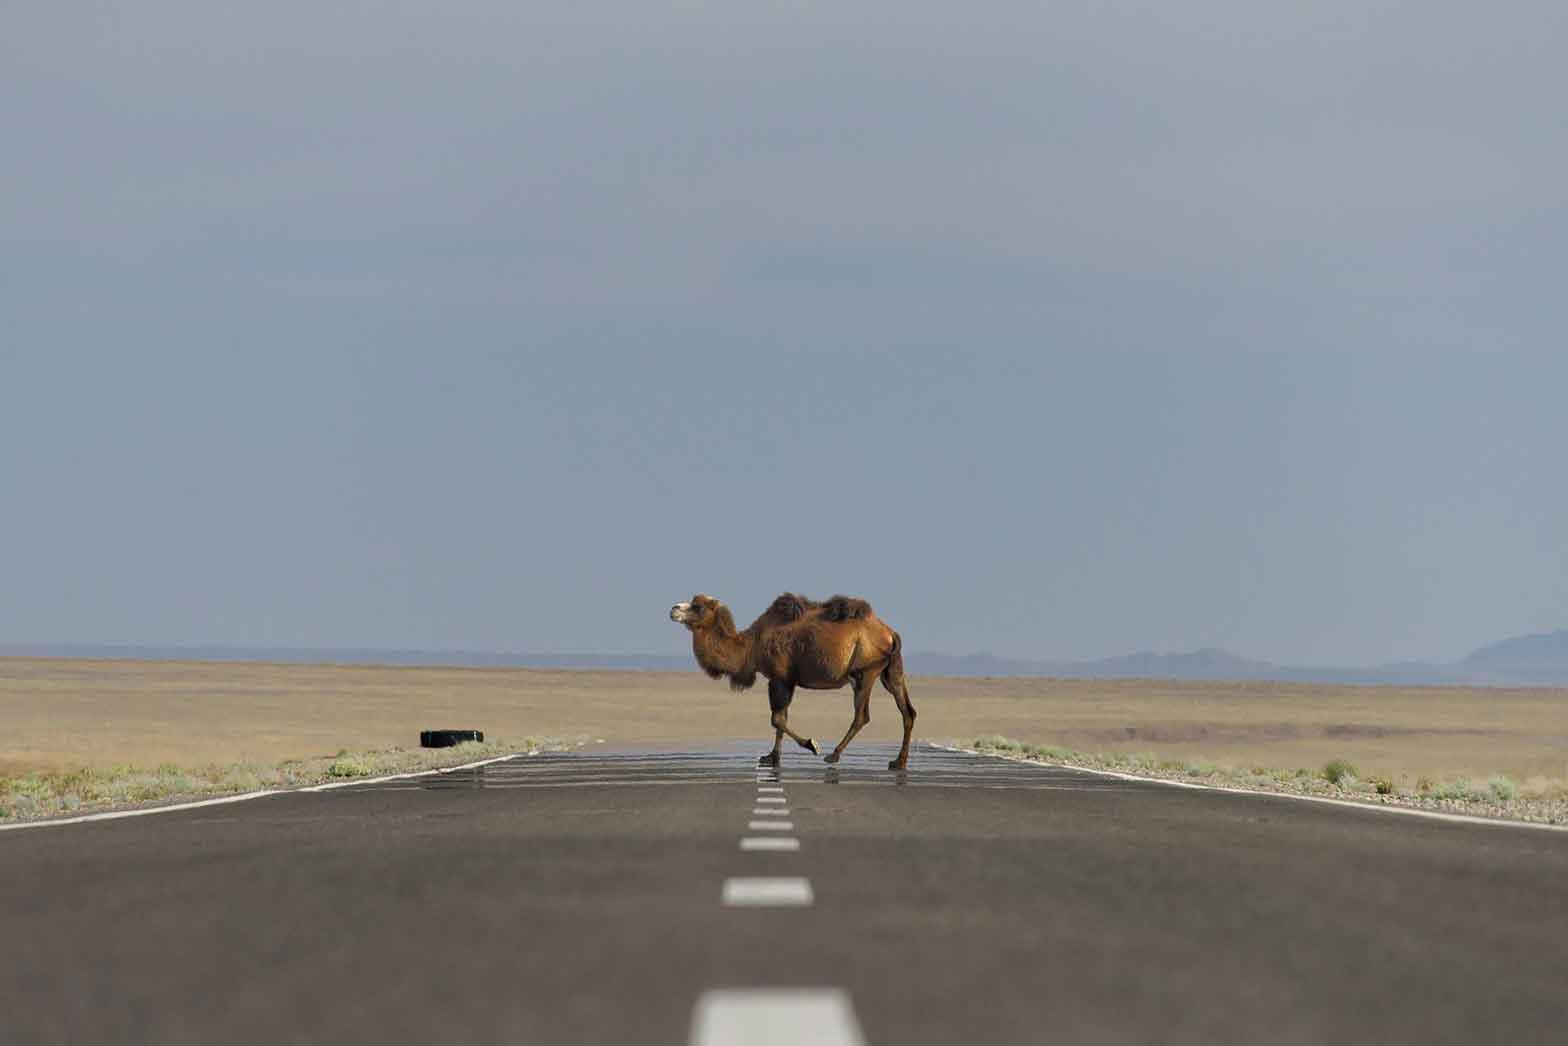 Camel road crossing